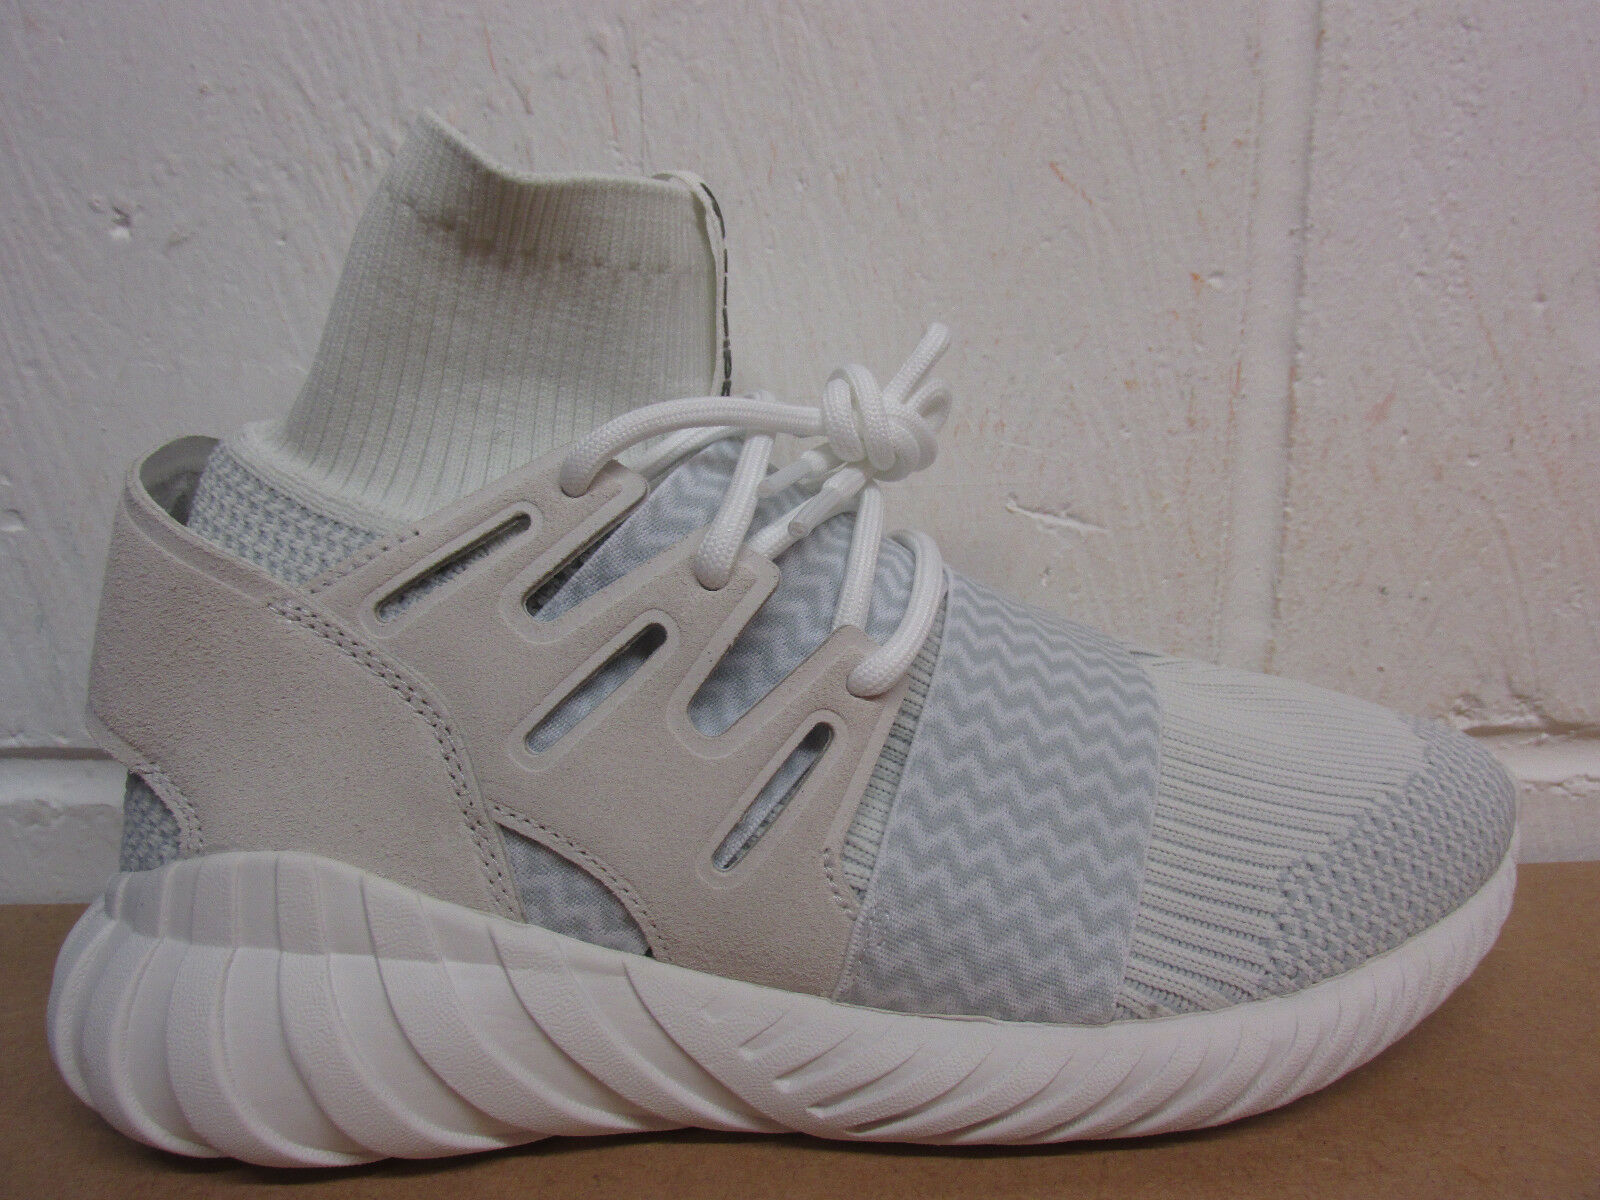 Adidas Originals Tubular Doom PK Mens Hi Top Trainers S80509 Sneakers Shoes Brand discount